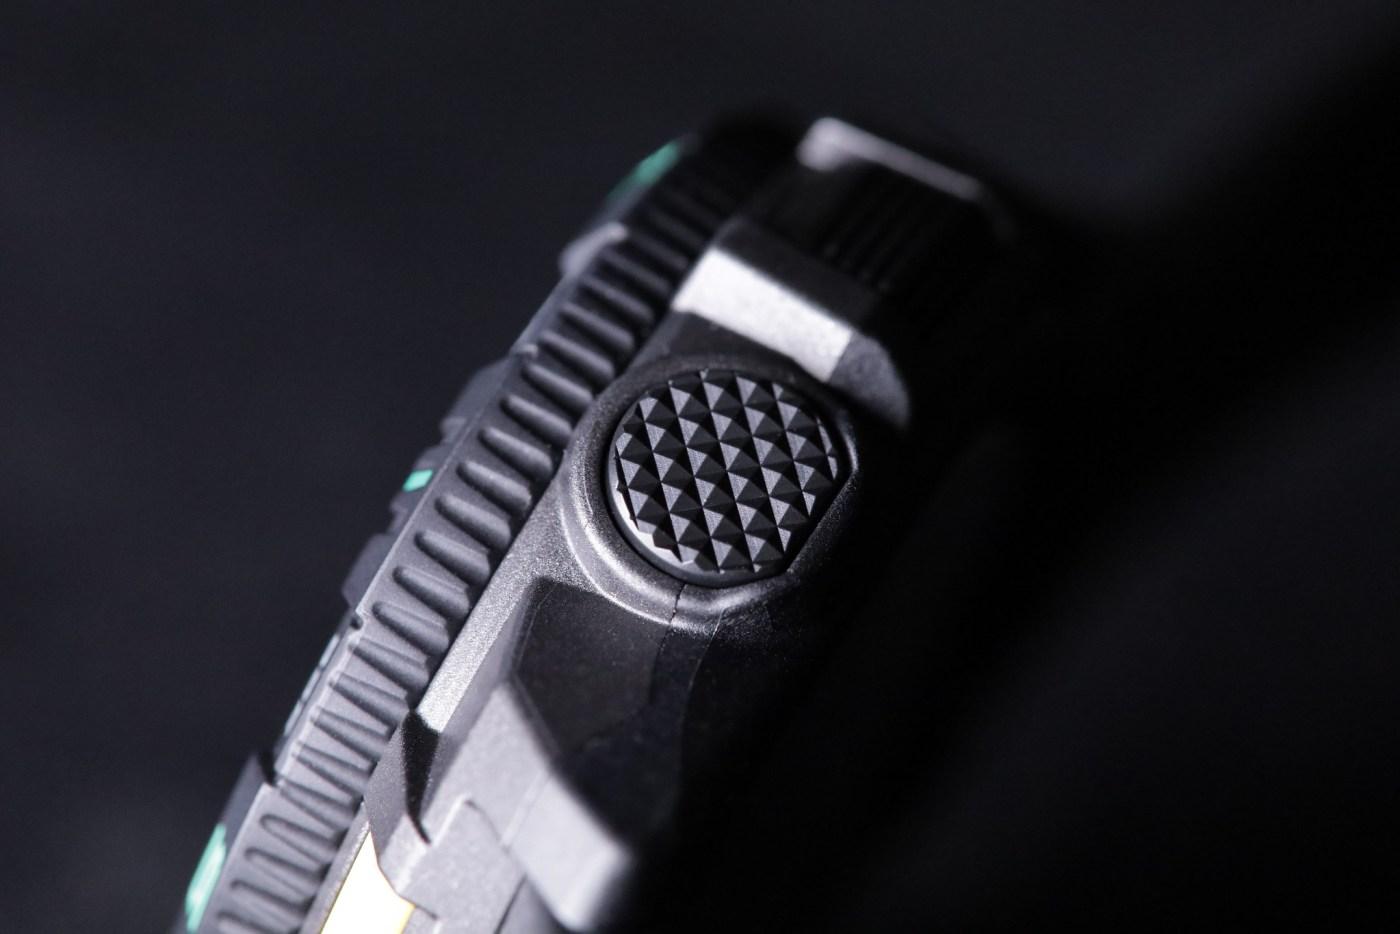 Casio Pro Trek PRT-B50 button detail